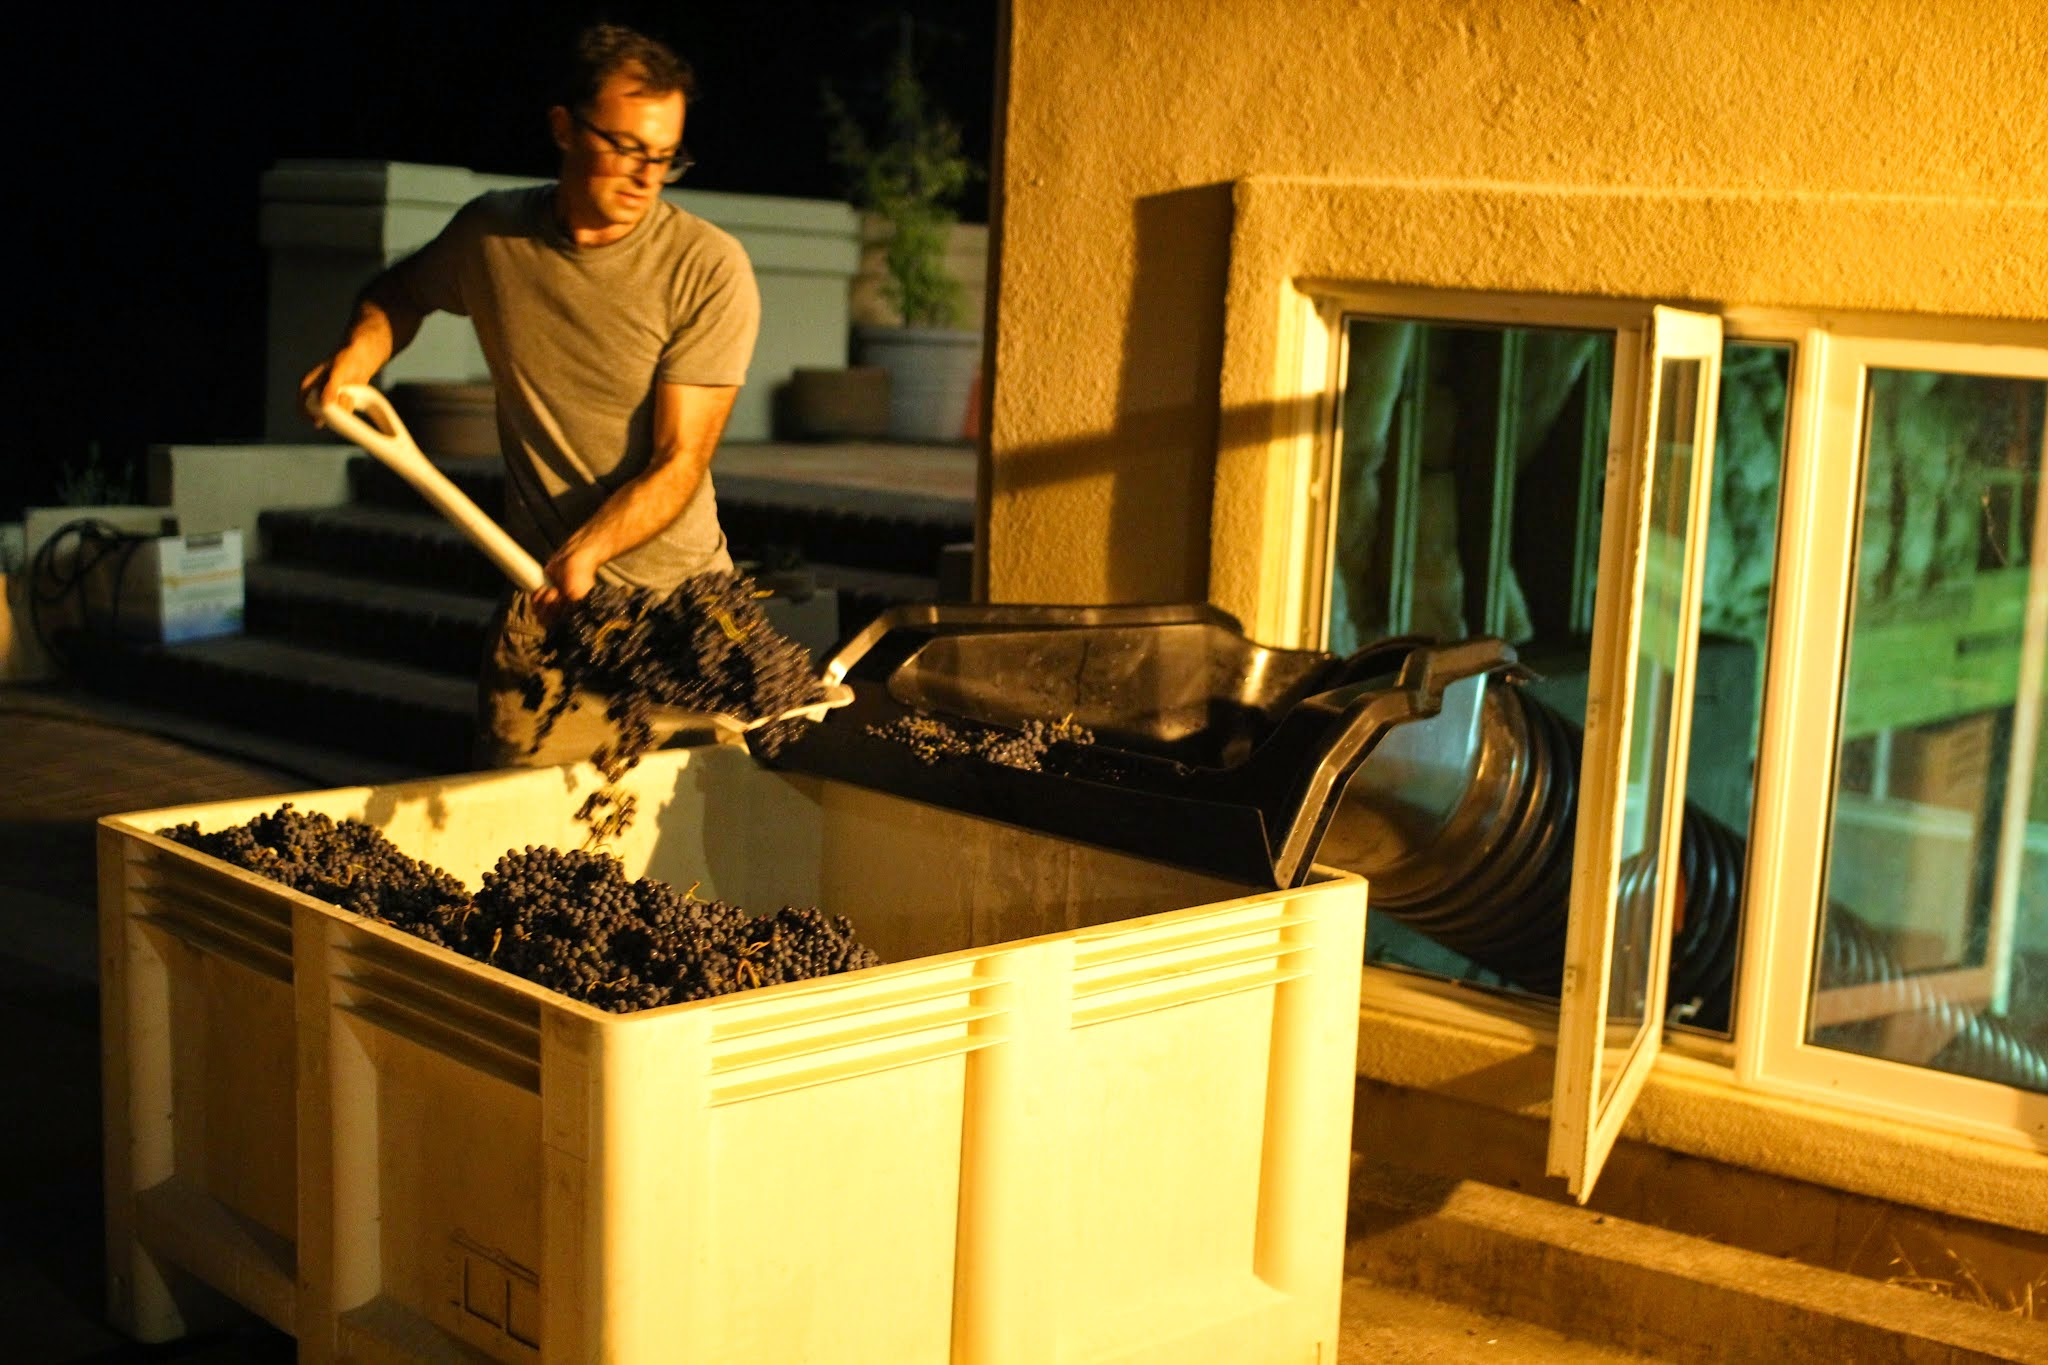 Shaunt Oungoulian shovelling grapes.JPG